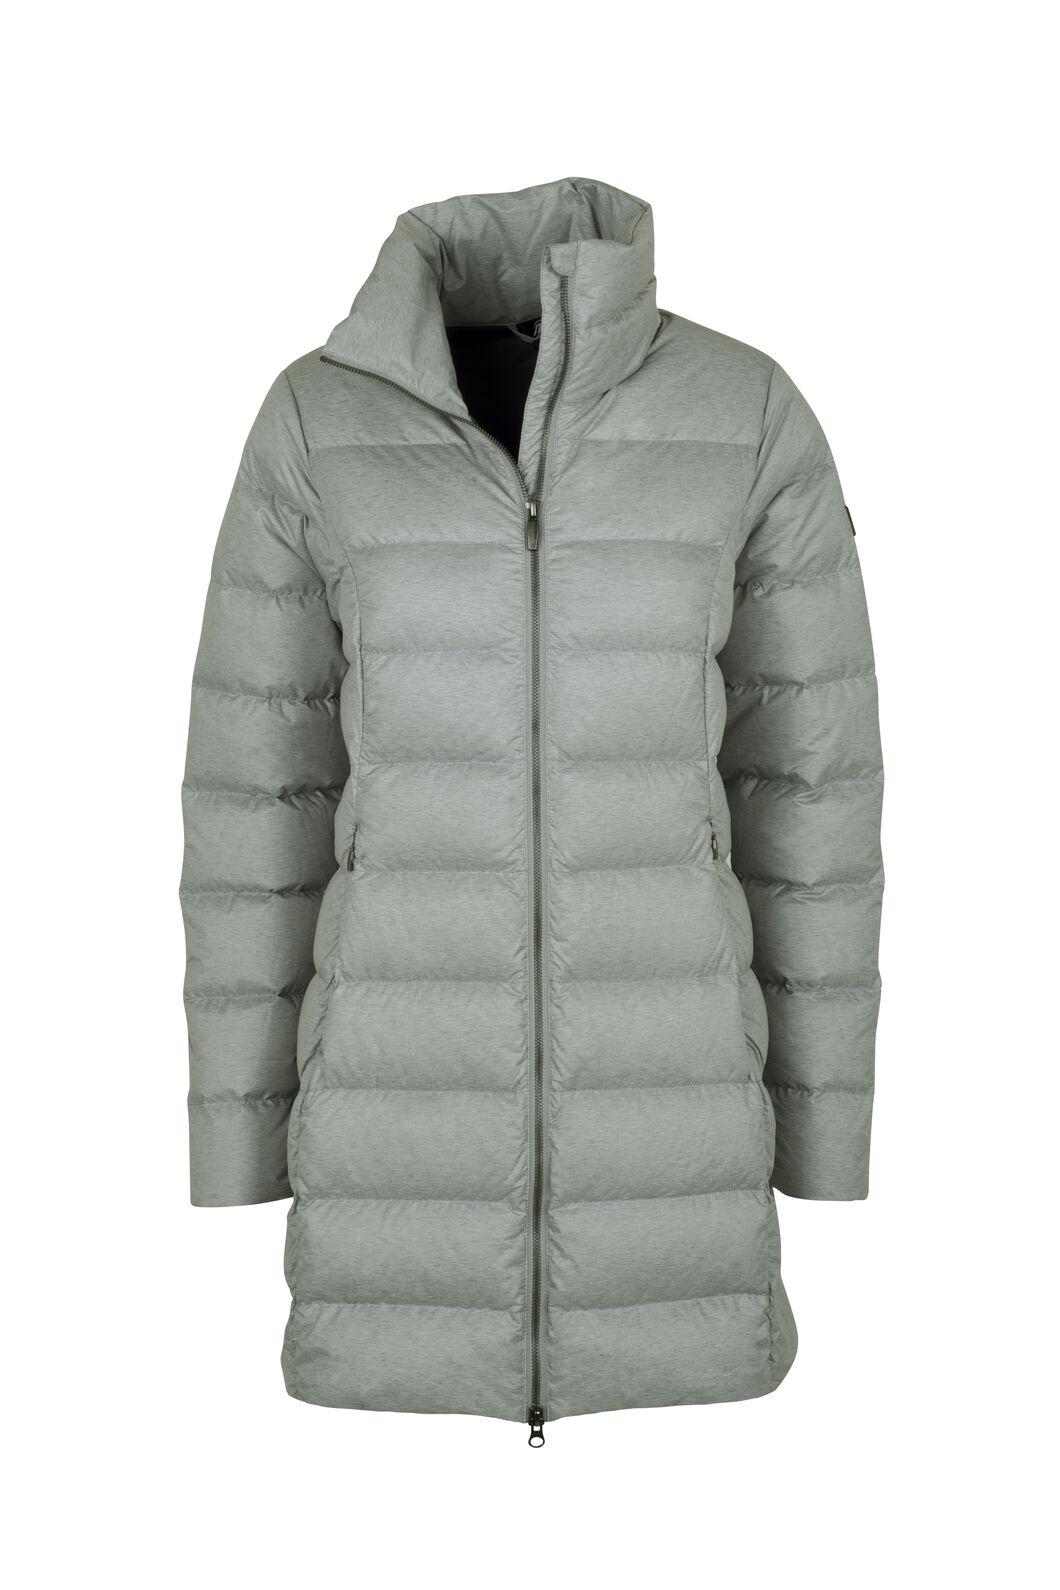 3e62b2e54 Macpac Demi Down Coat - Women's | Macpac